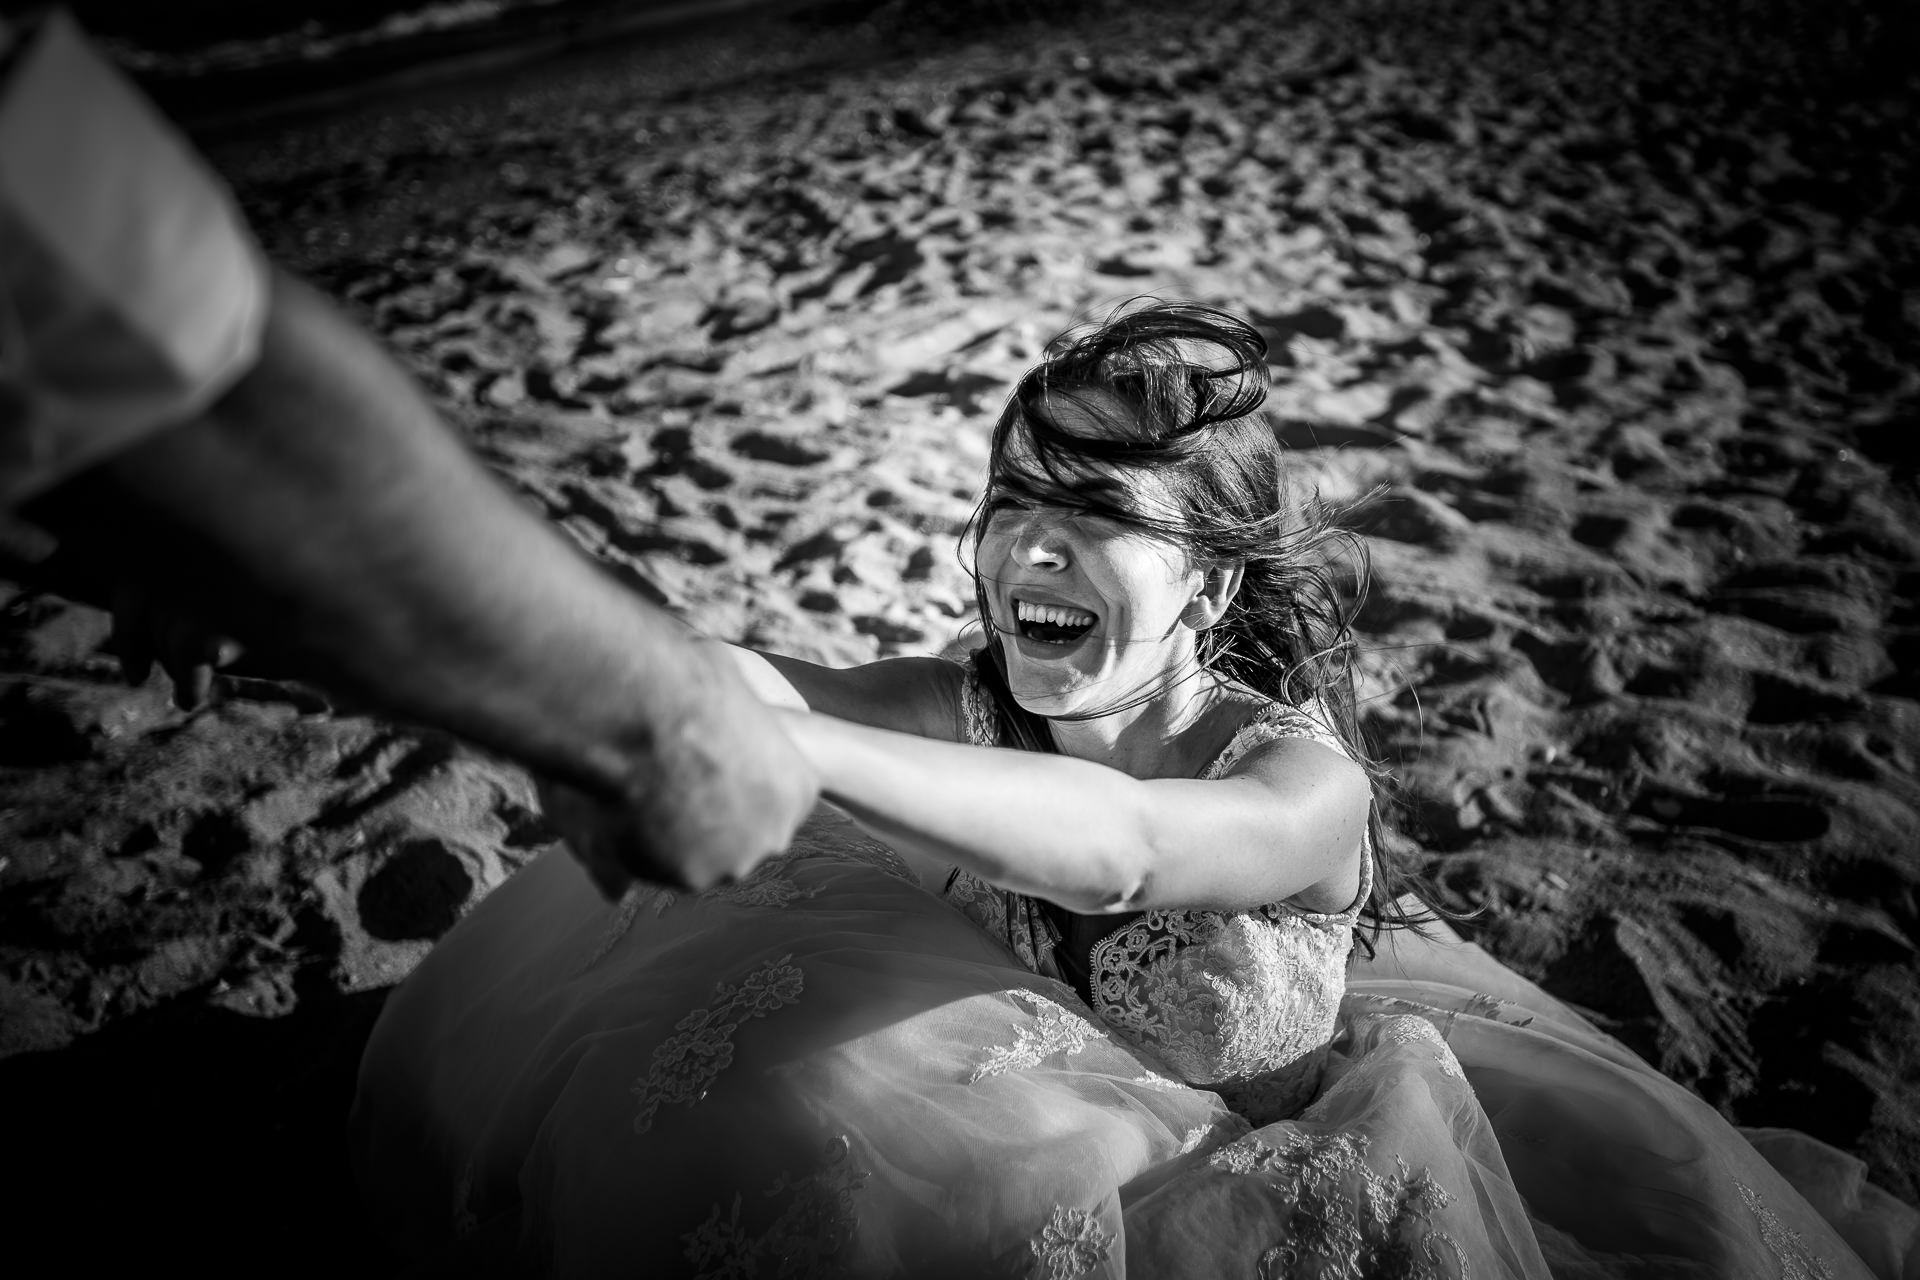 Şedinţă foto Trash The Dress - Vadu + Midia - Mihaela şi Alexandru - Mihai Zaharia Photography - 15